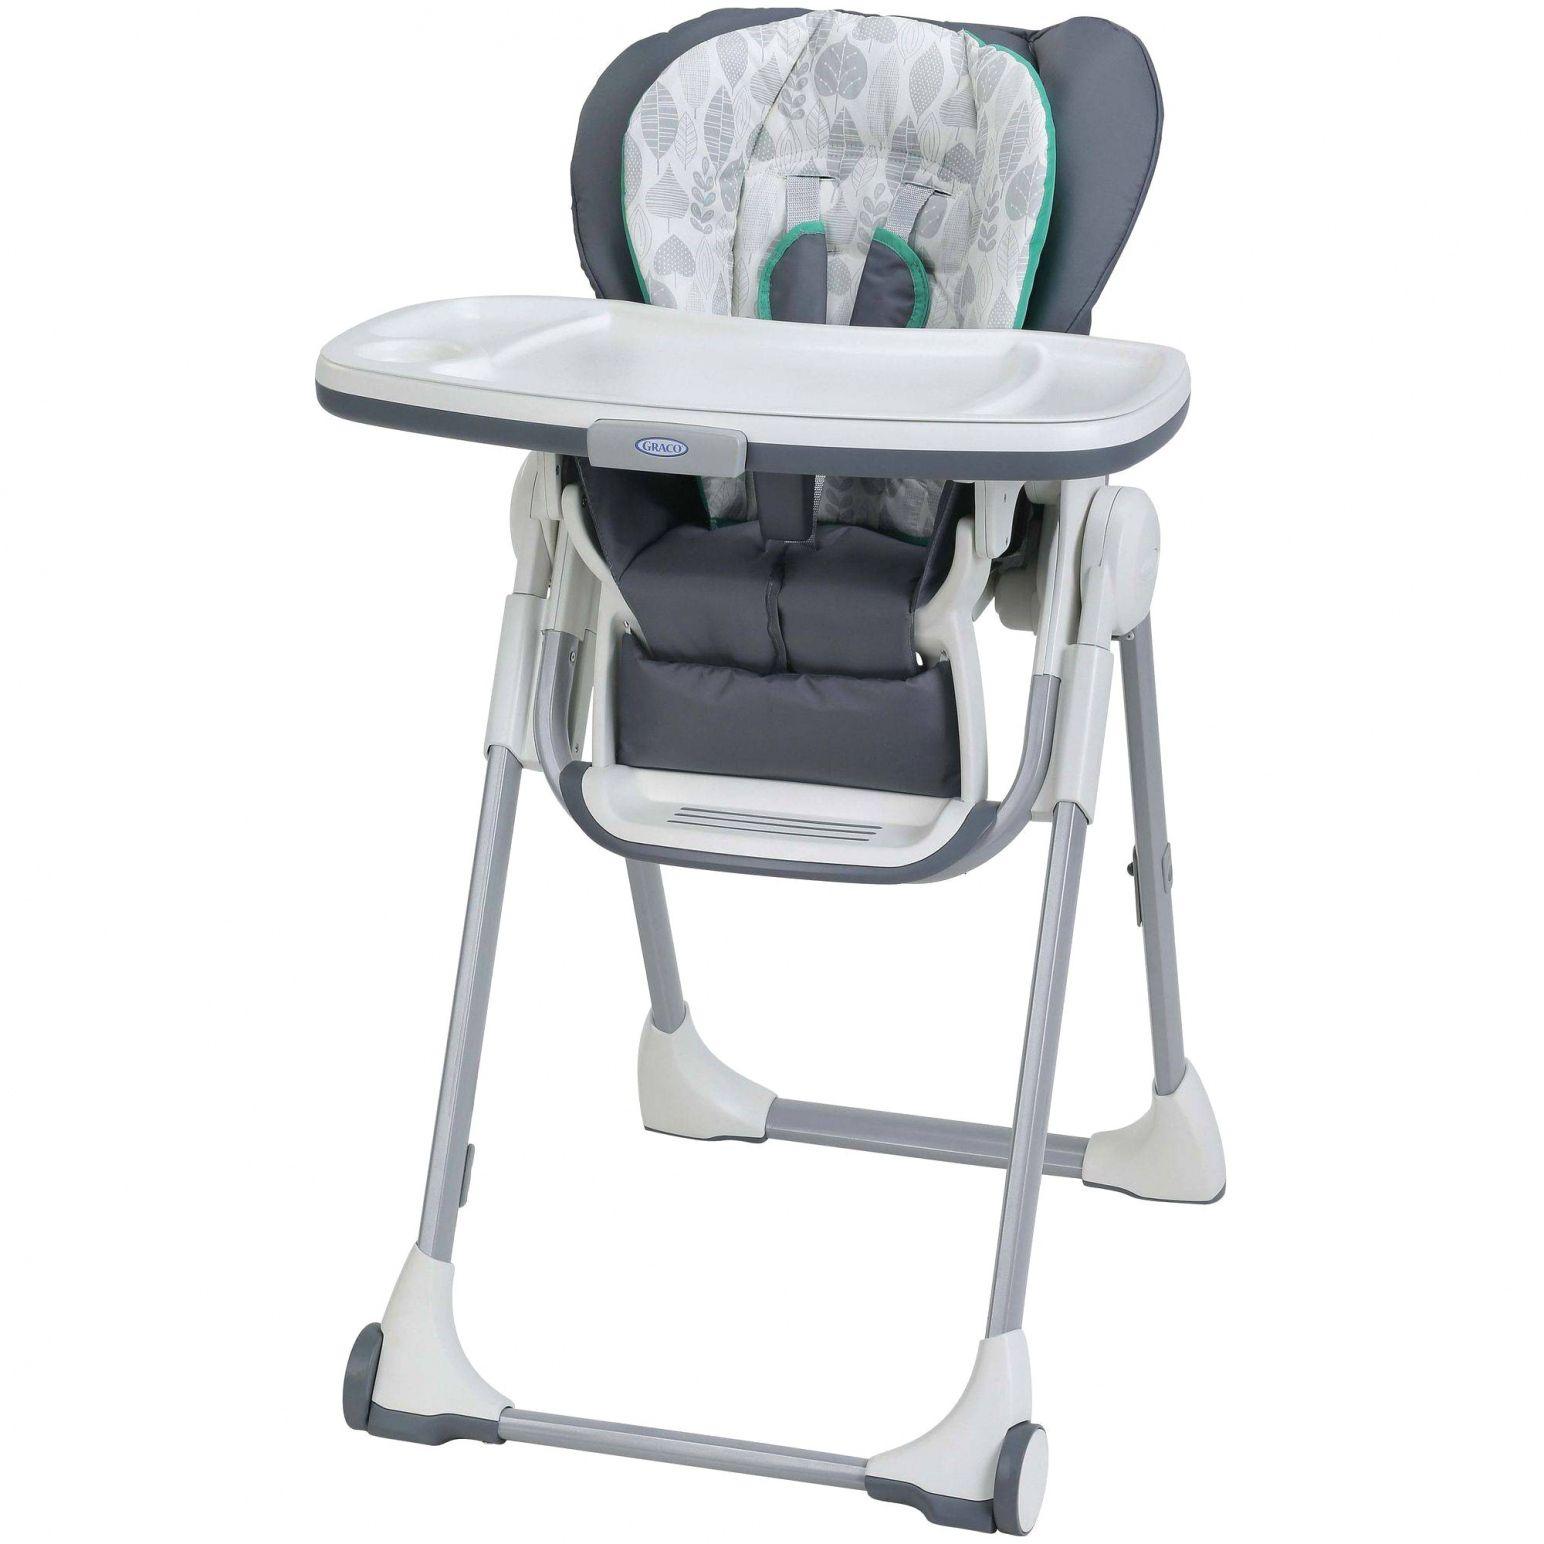 100+ 4 In One High Chair Ideas for Kitchen Backsplash